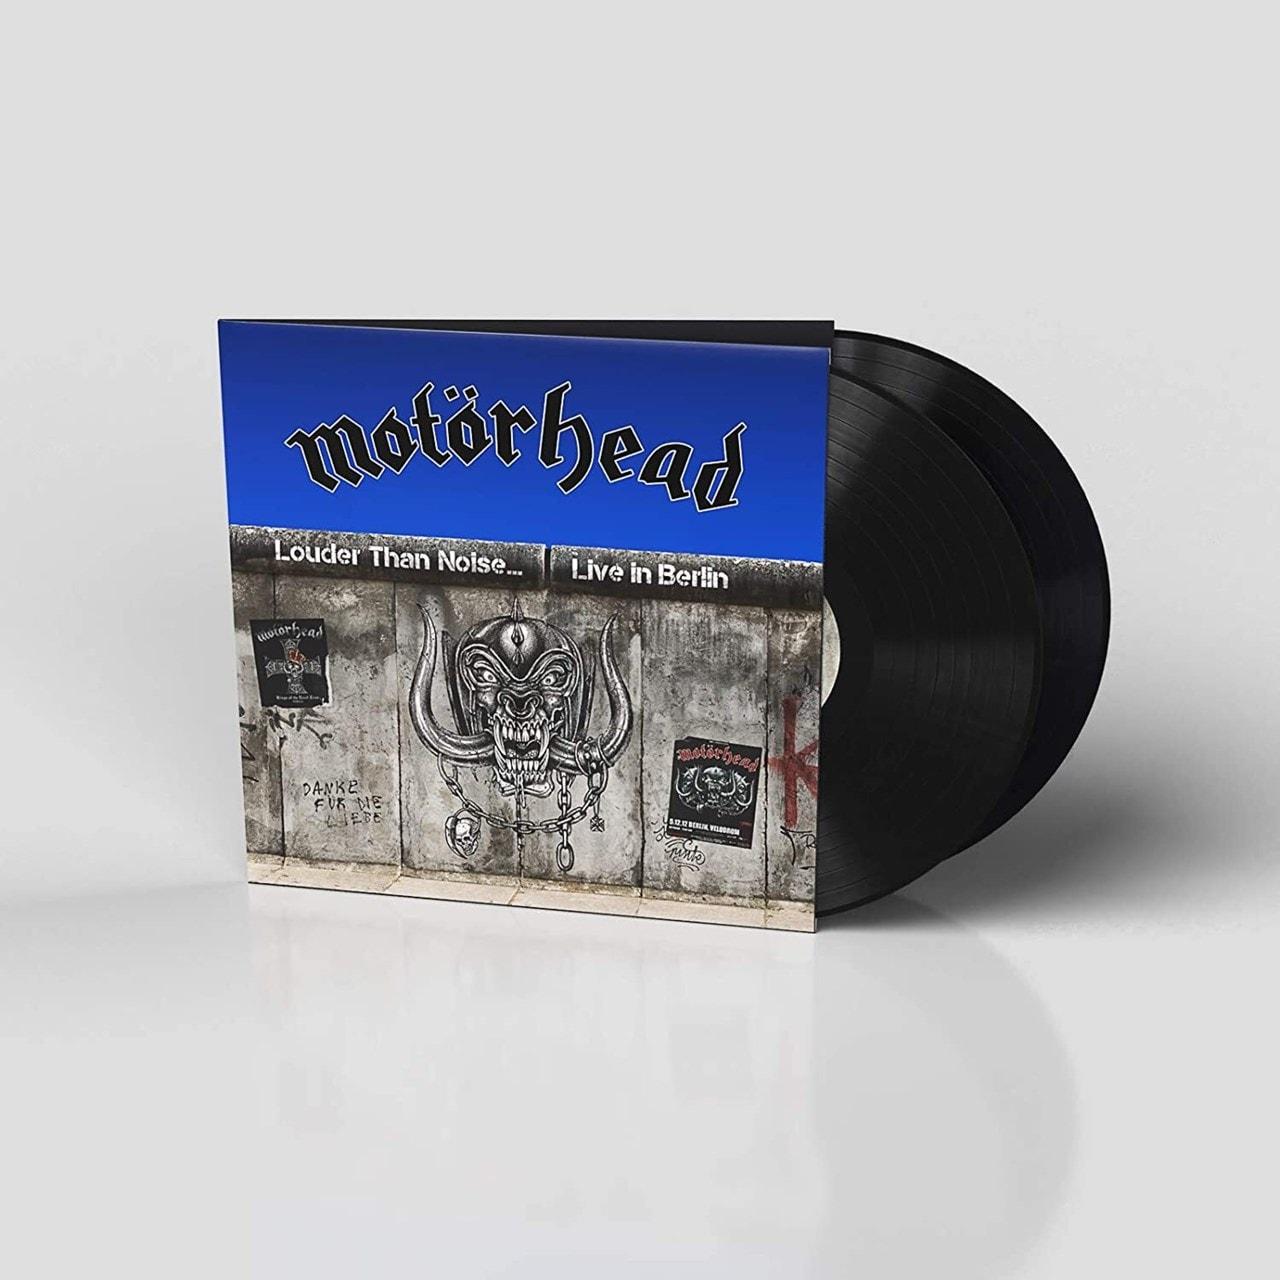 Louder Than Noise... Live in Berlin - 2